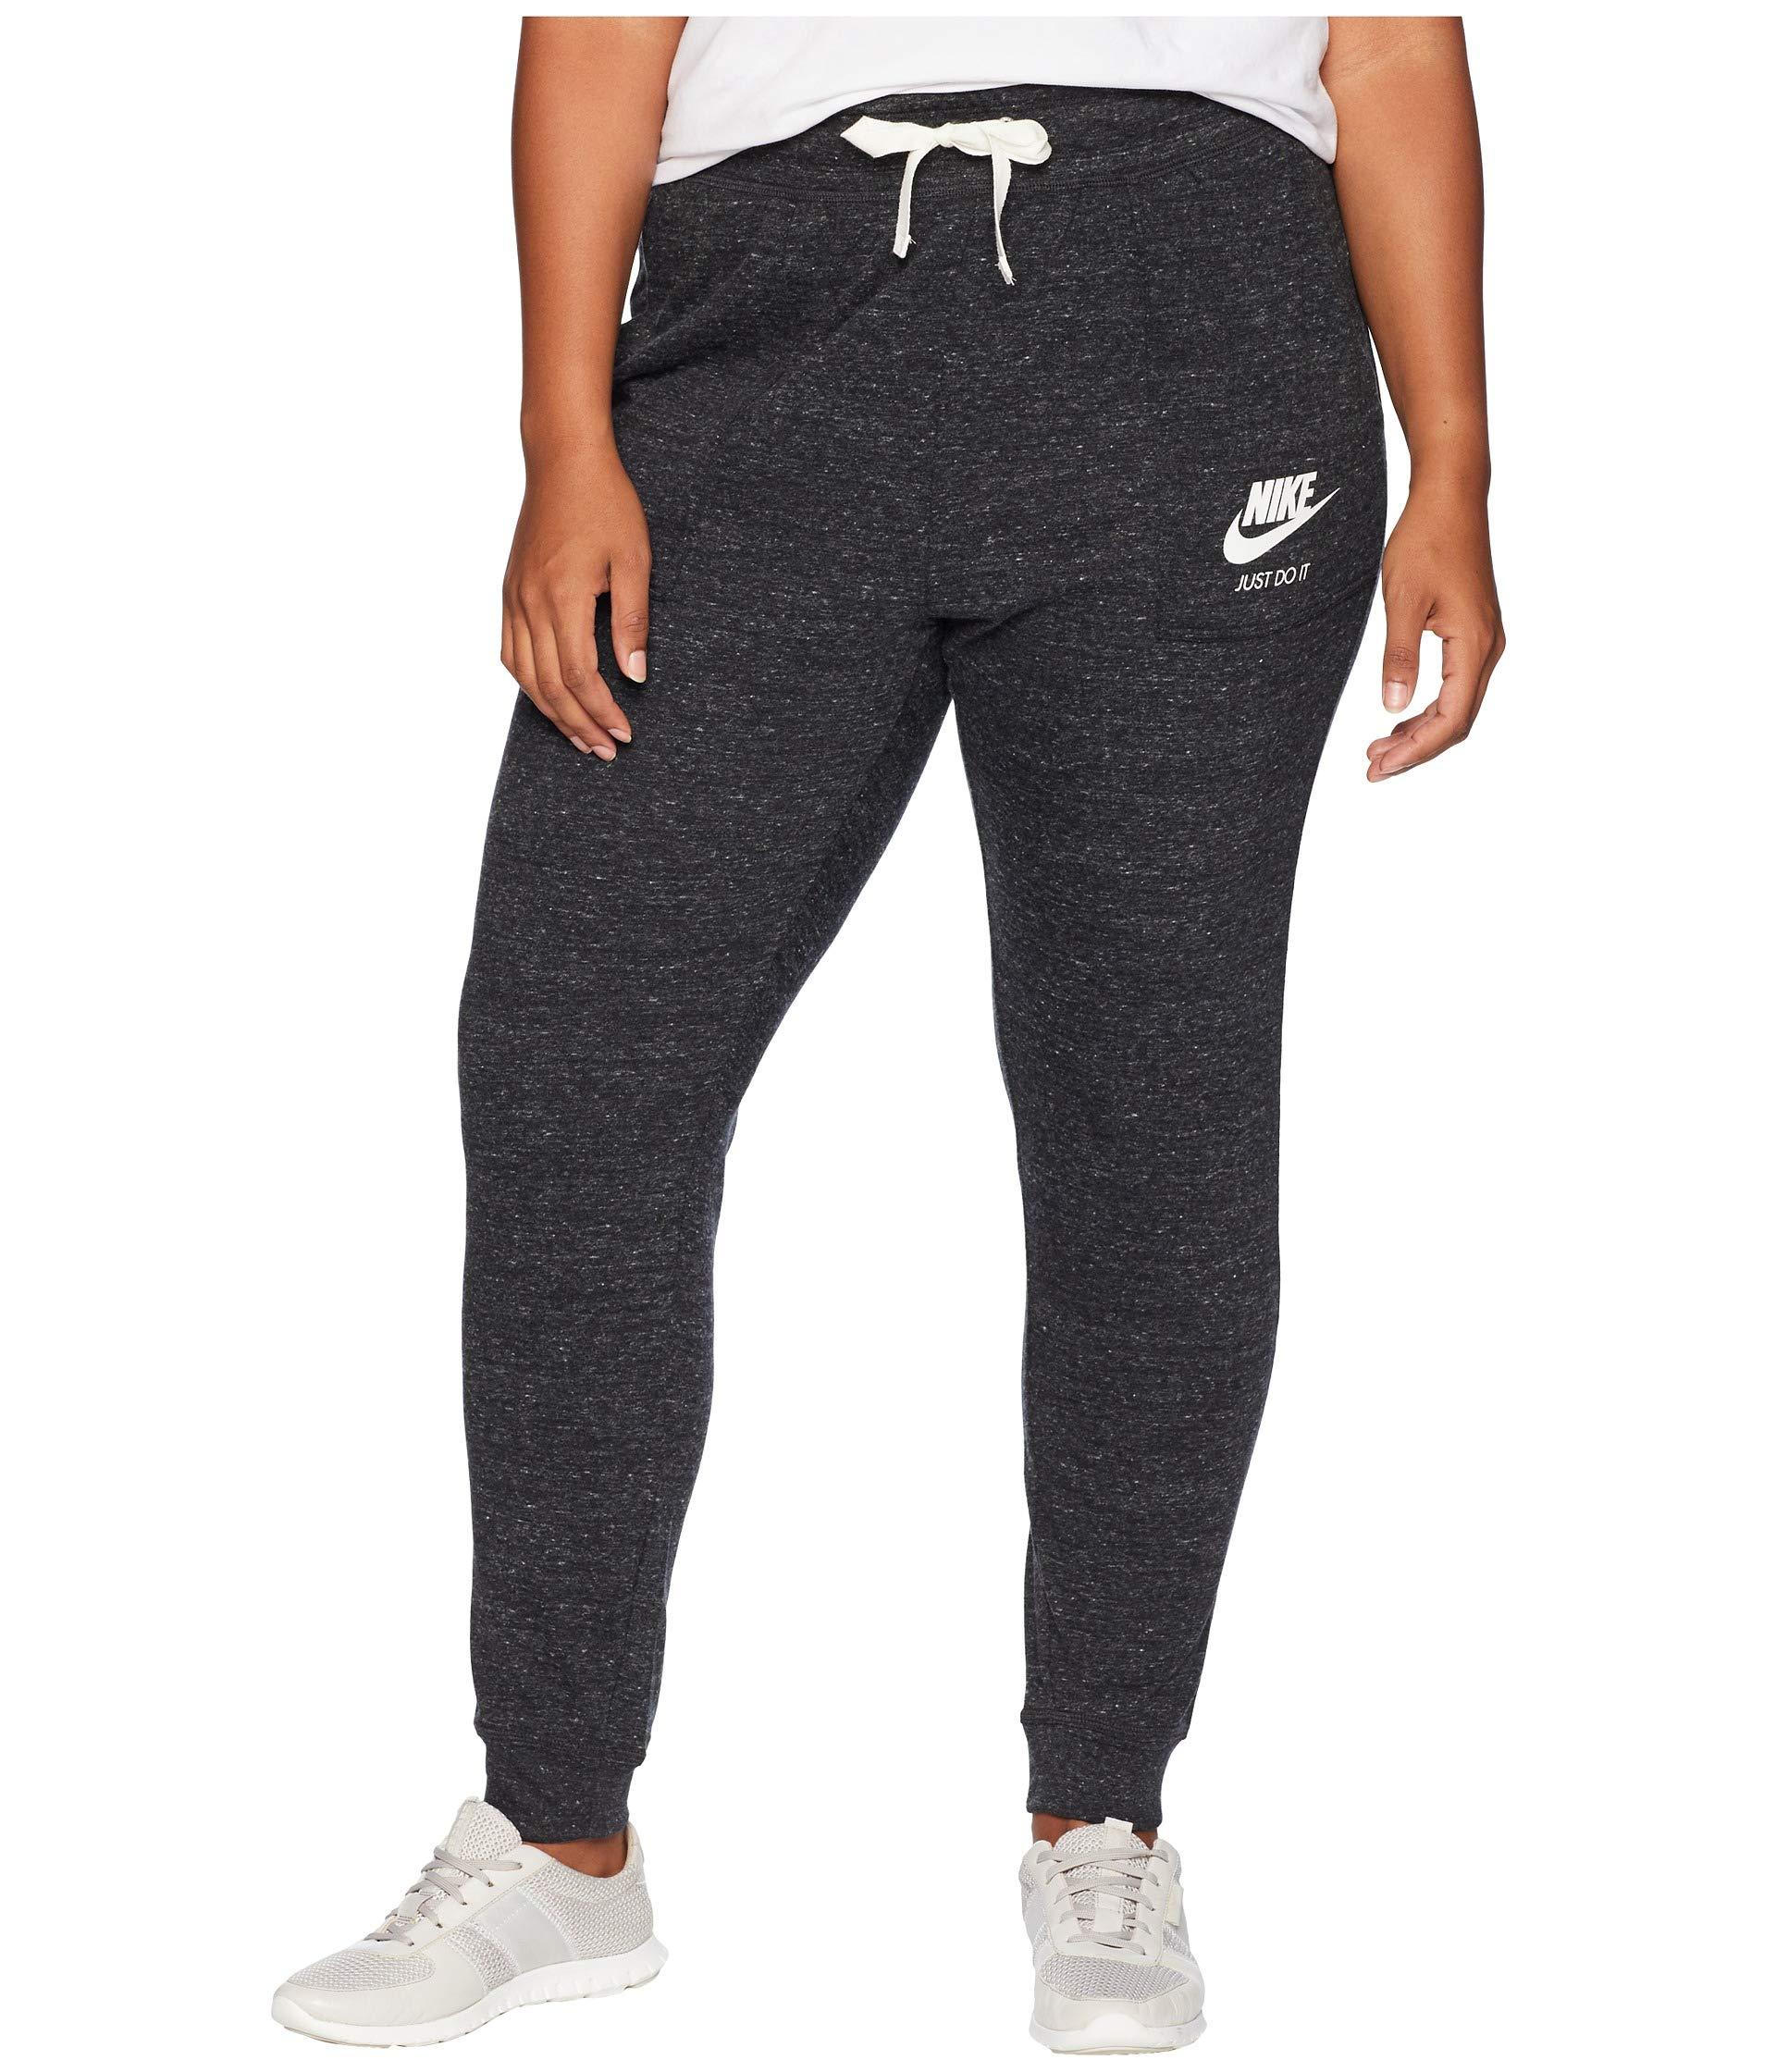 Vintage Black Pants Plus sail Nike Gym Extended Size pqxgWwPR